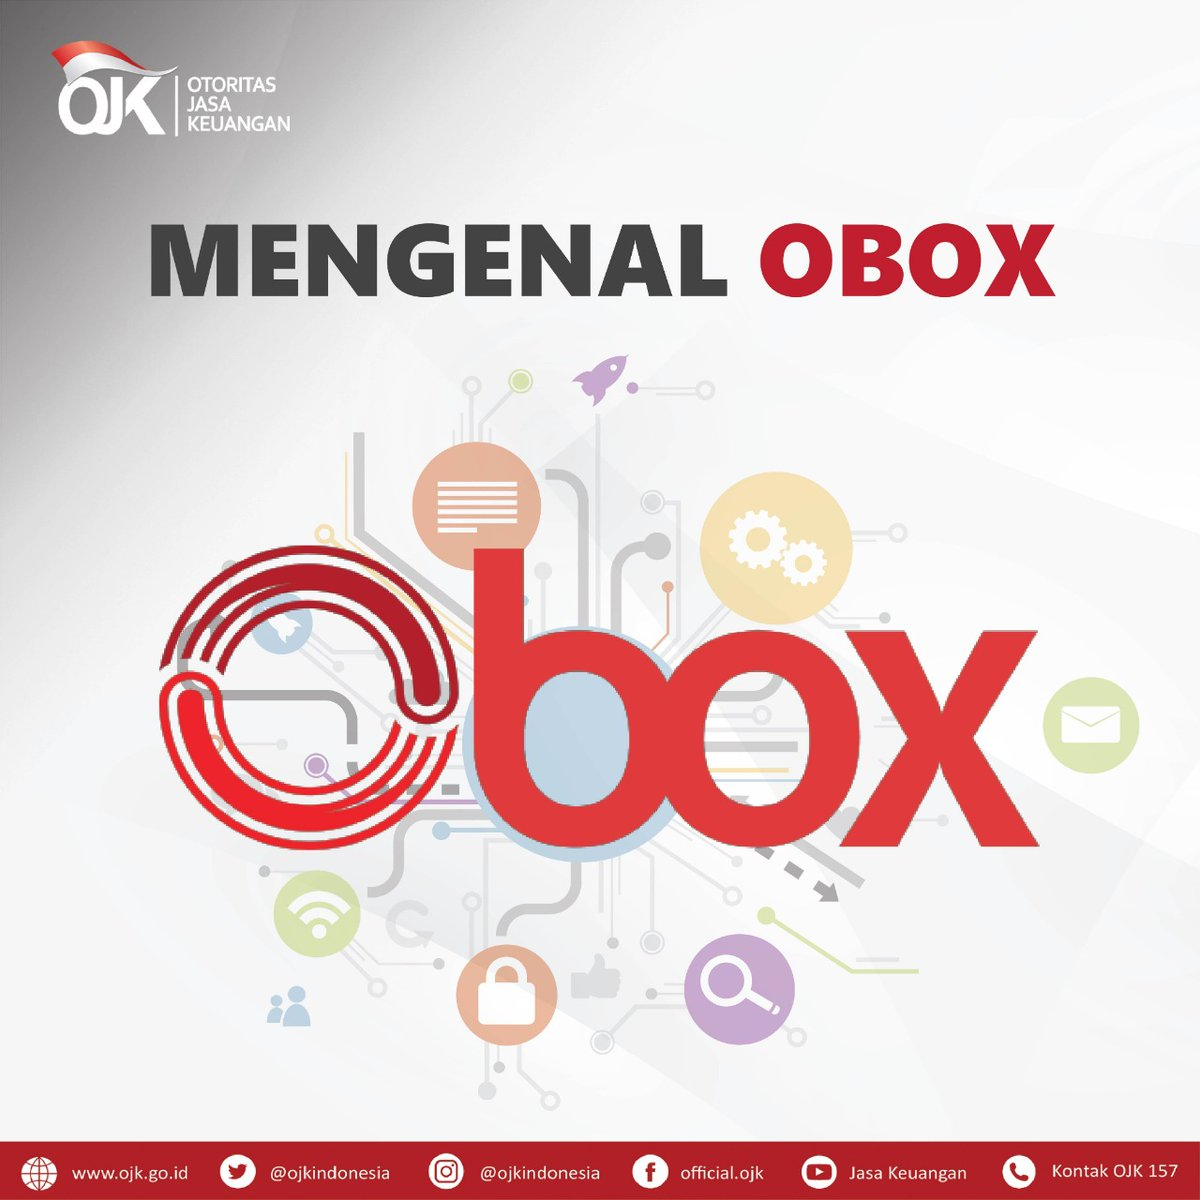 Ojk Indonesia On Twitter Sobat Ojk Sudah Kenal Obox Belum Bagi Yang Belum Kenal Obox Atau Ojk Box Adalah Aplikasi Berbasis Teknologi Digital Untuk Mengawasi Sektor Jasa Keuangan Yang Dimulai Dari Sektor